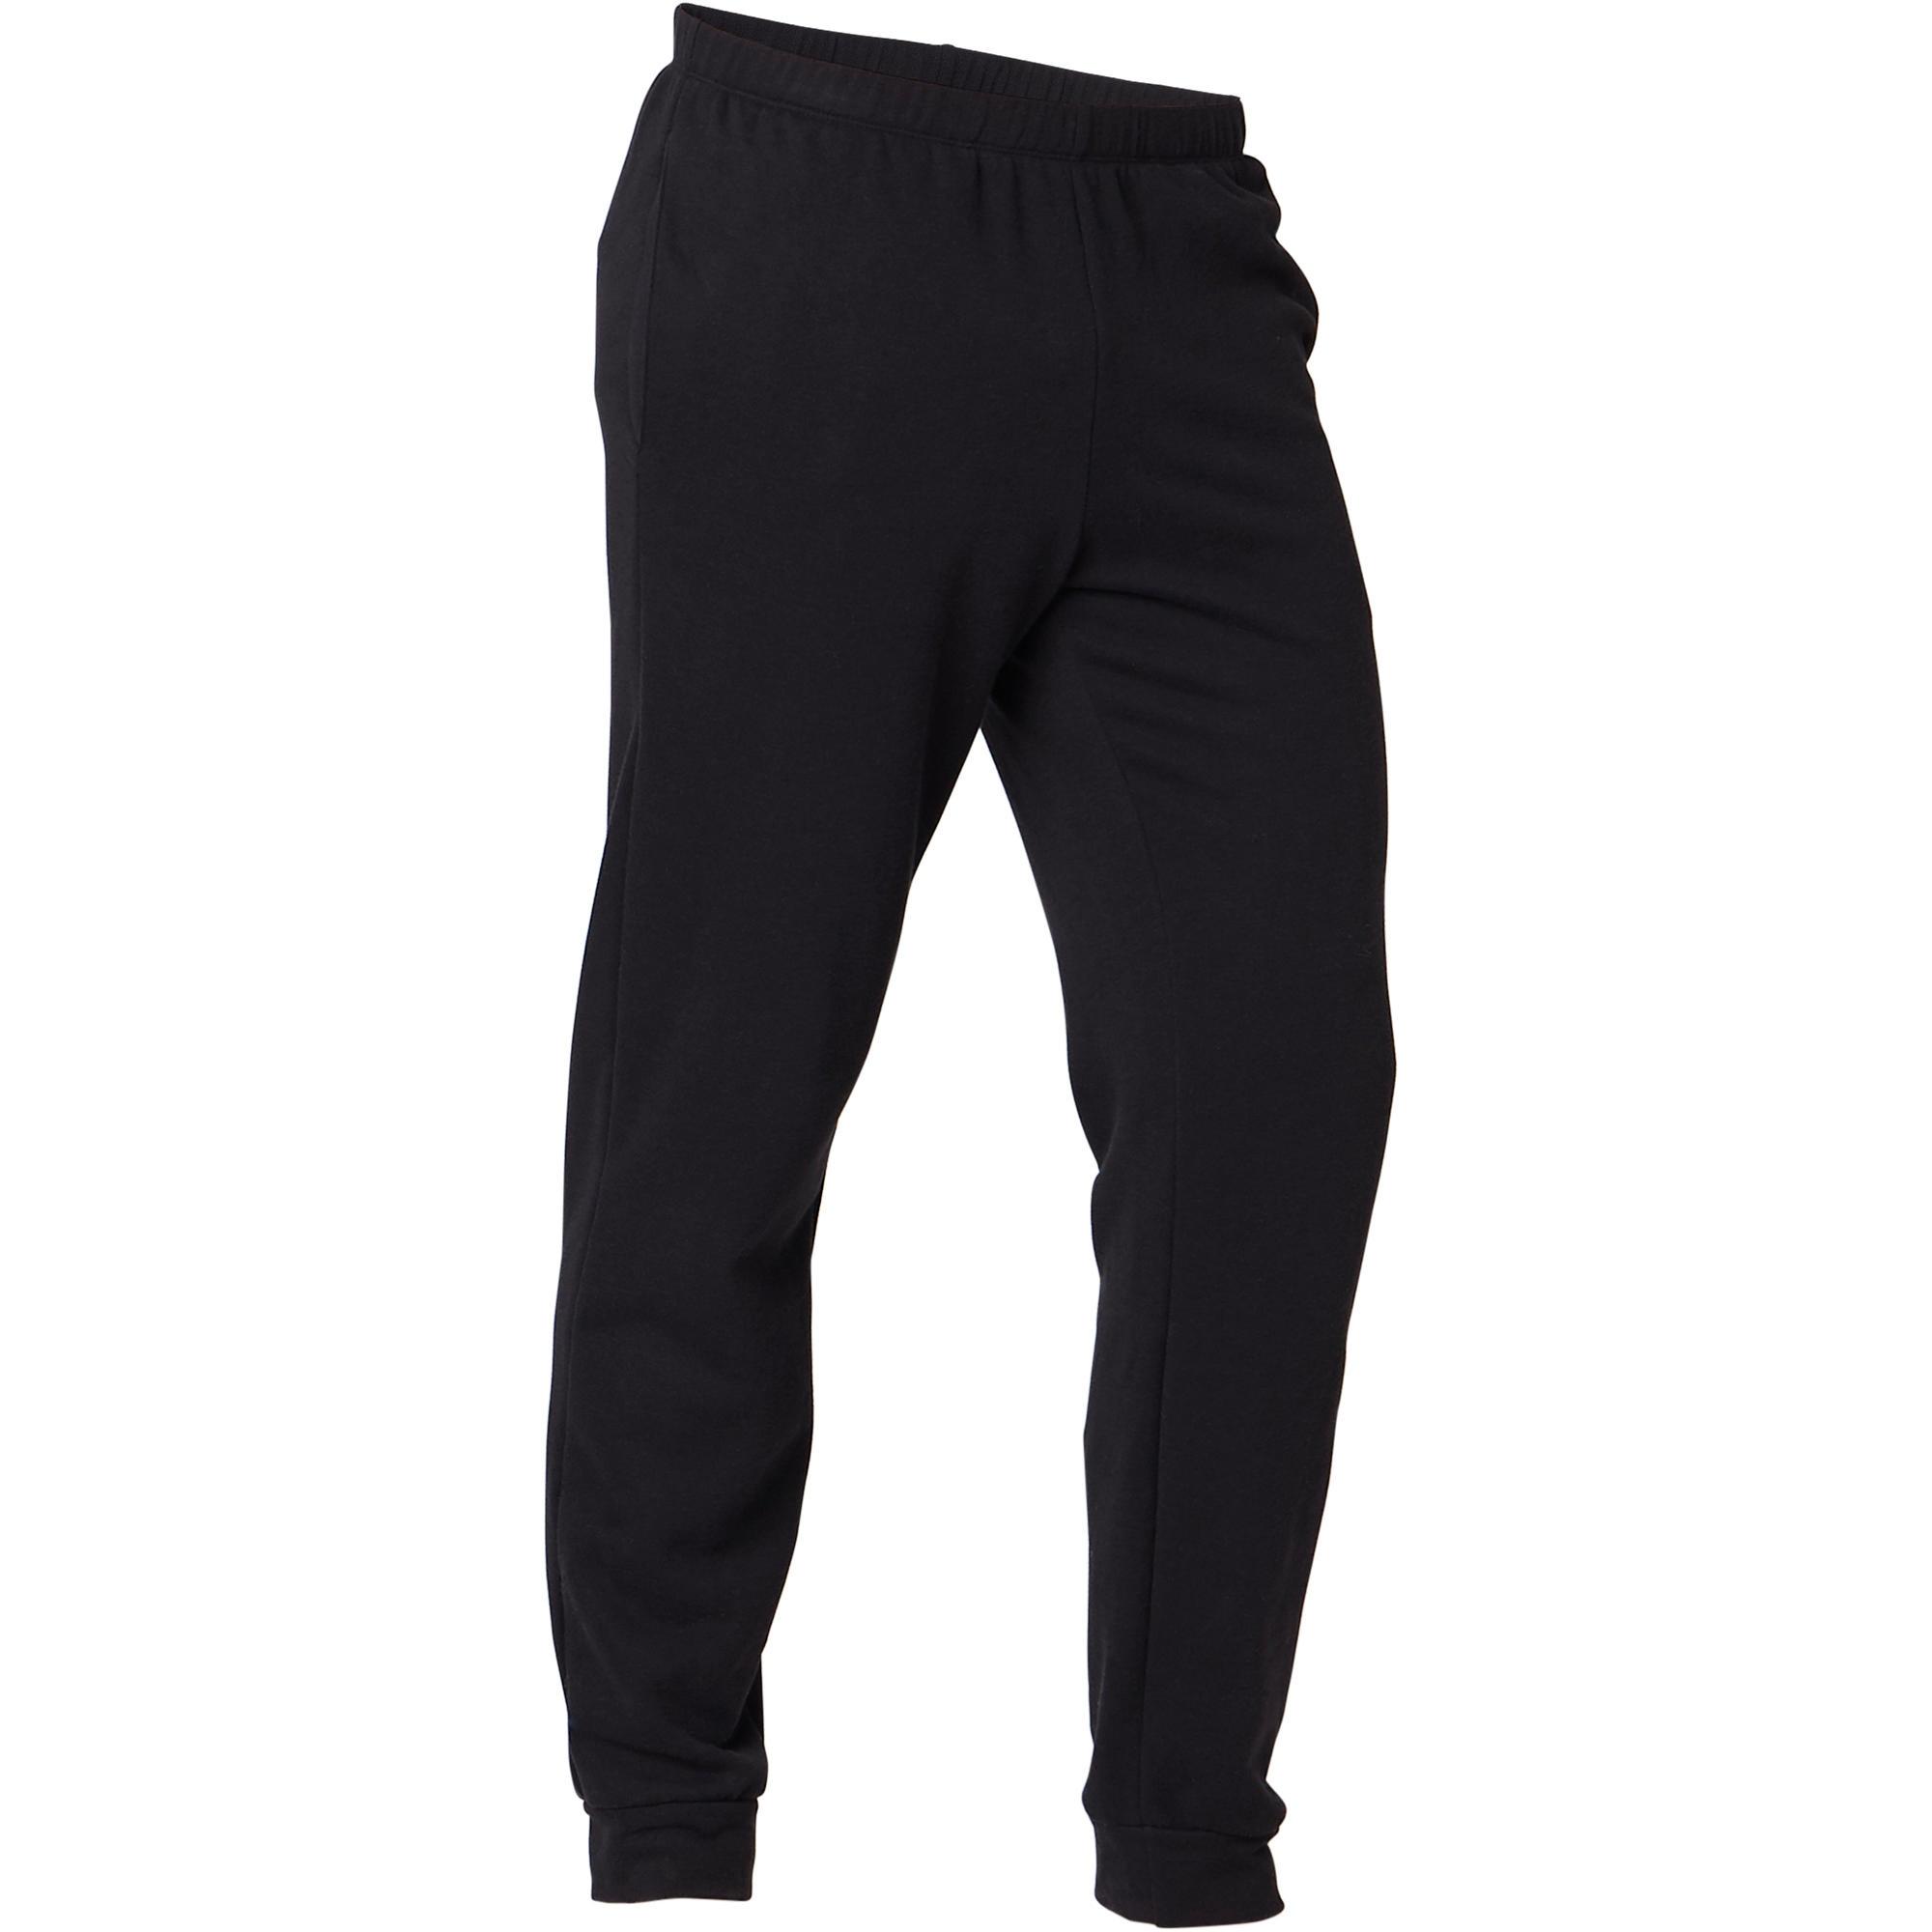 Pantalones Chandal Pegados 78 Descuento Www Vantravel Com Ar